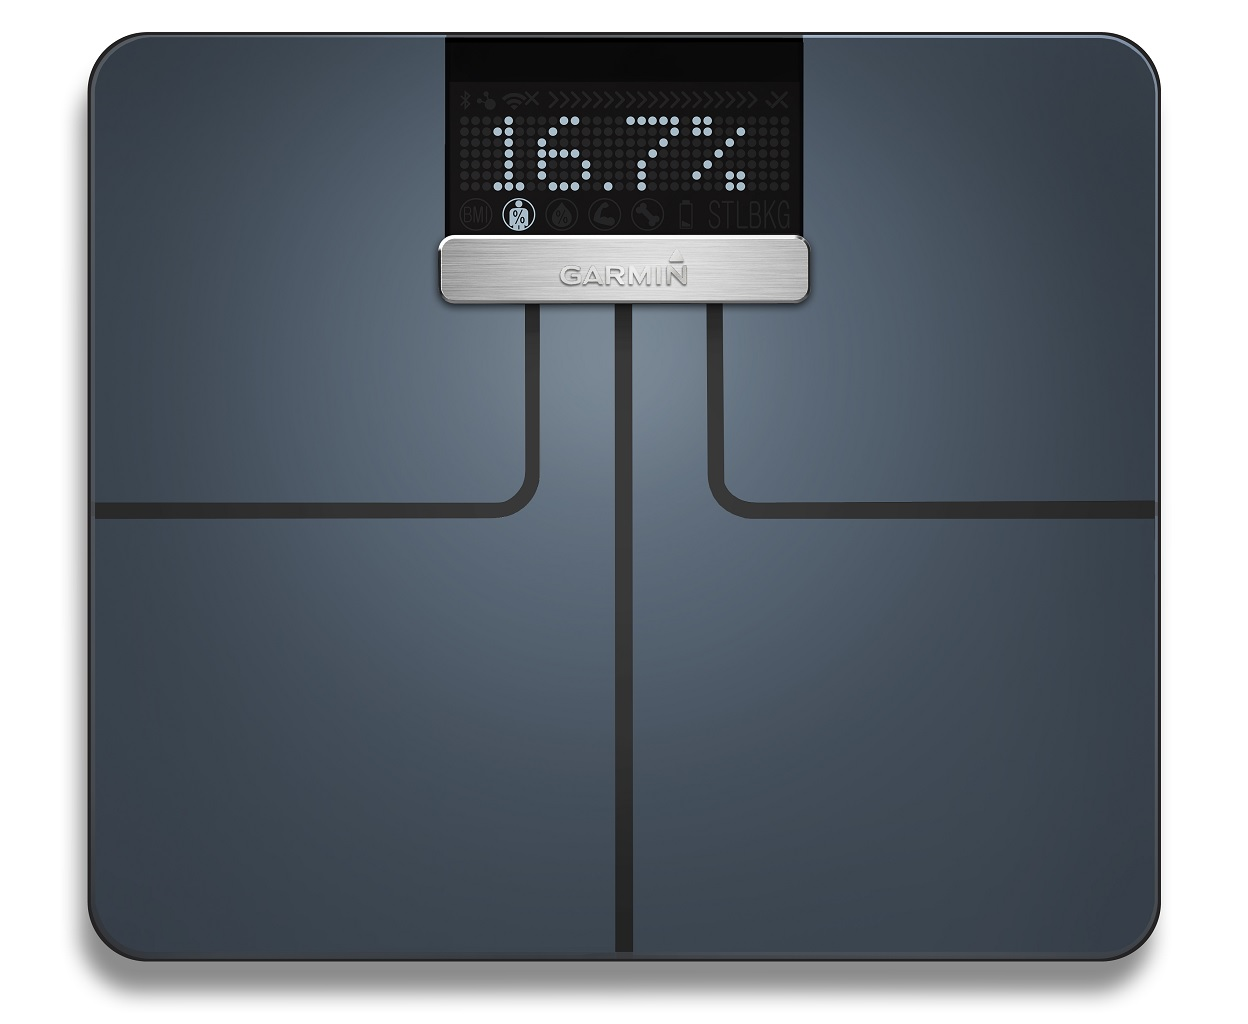 Garmin Smart Scale sd